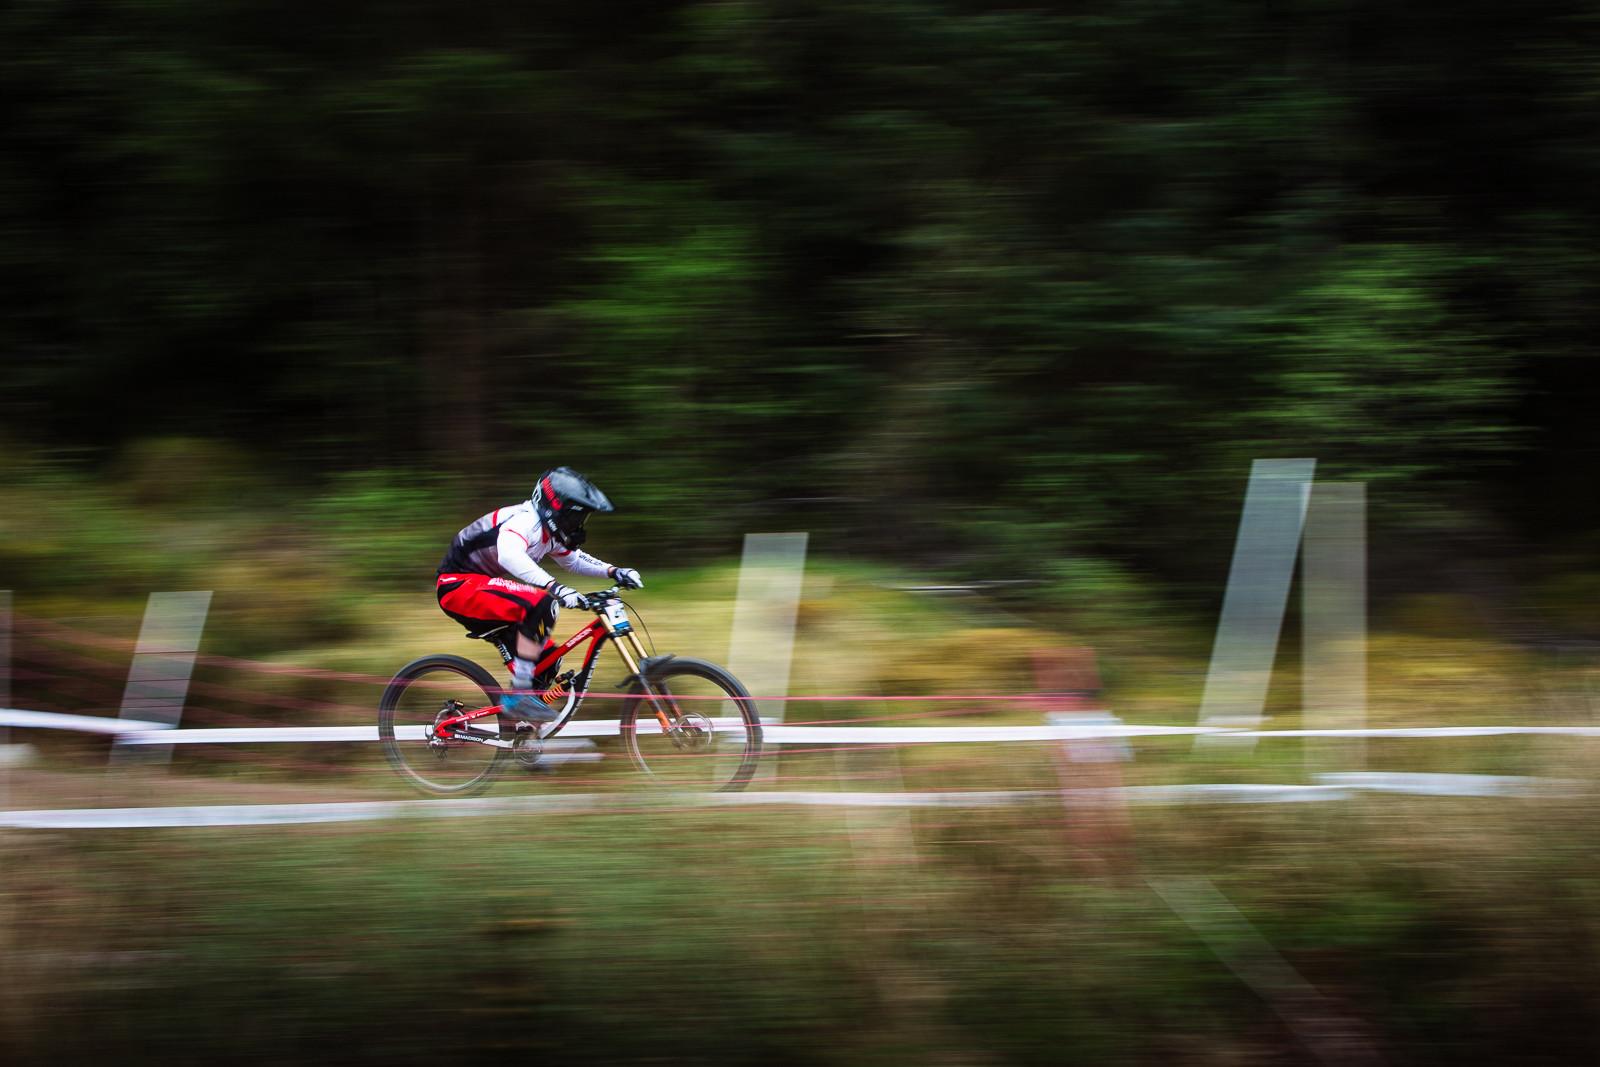 Matt Walker, Junior Winner, Fort William BDS - Fort William DH Action from the British Downhill Series - Mountain Biking Pictures - Vital MTB